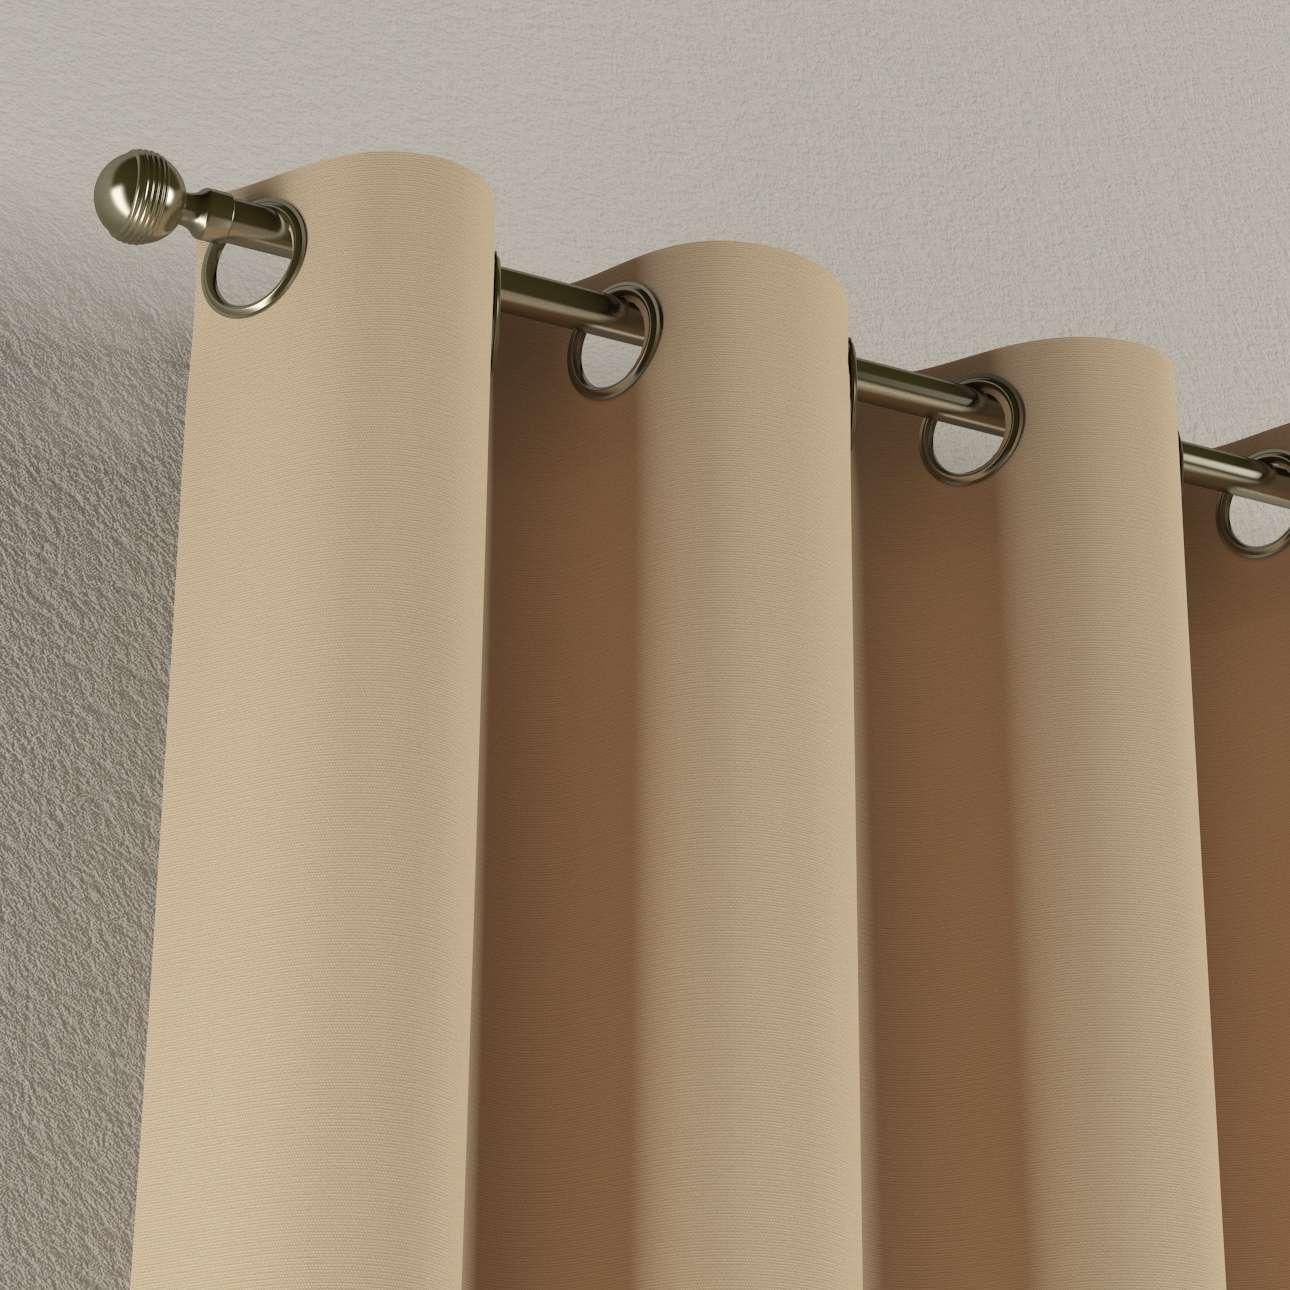 Ringlis függöny 130 x 260 cm a kollekcióból Bútorszövet Cotton Panama, Dekoranyag: 702-01